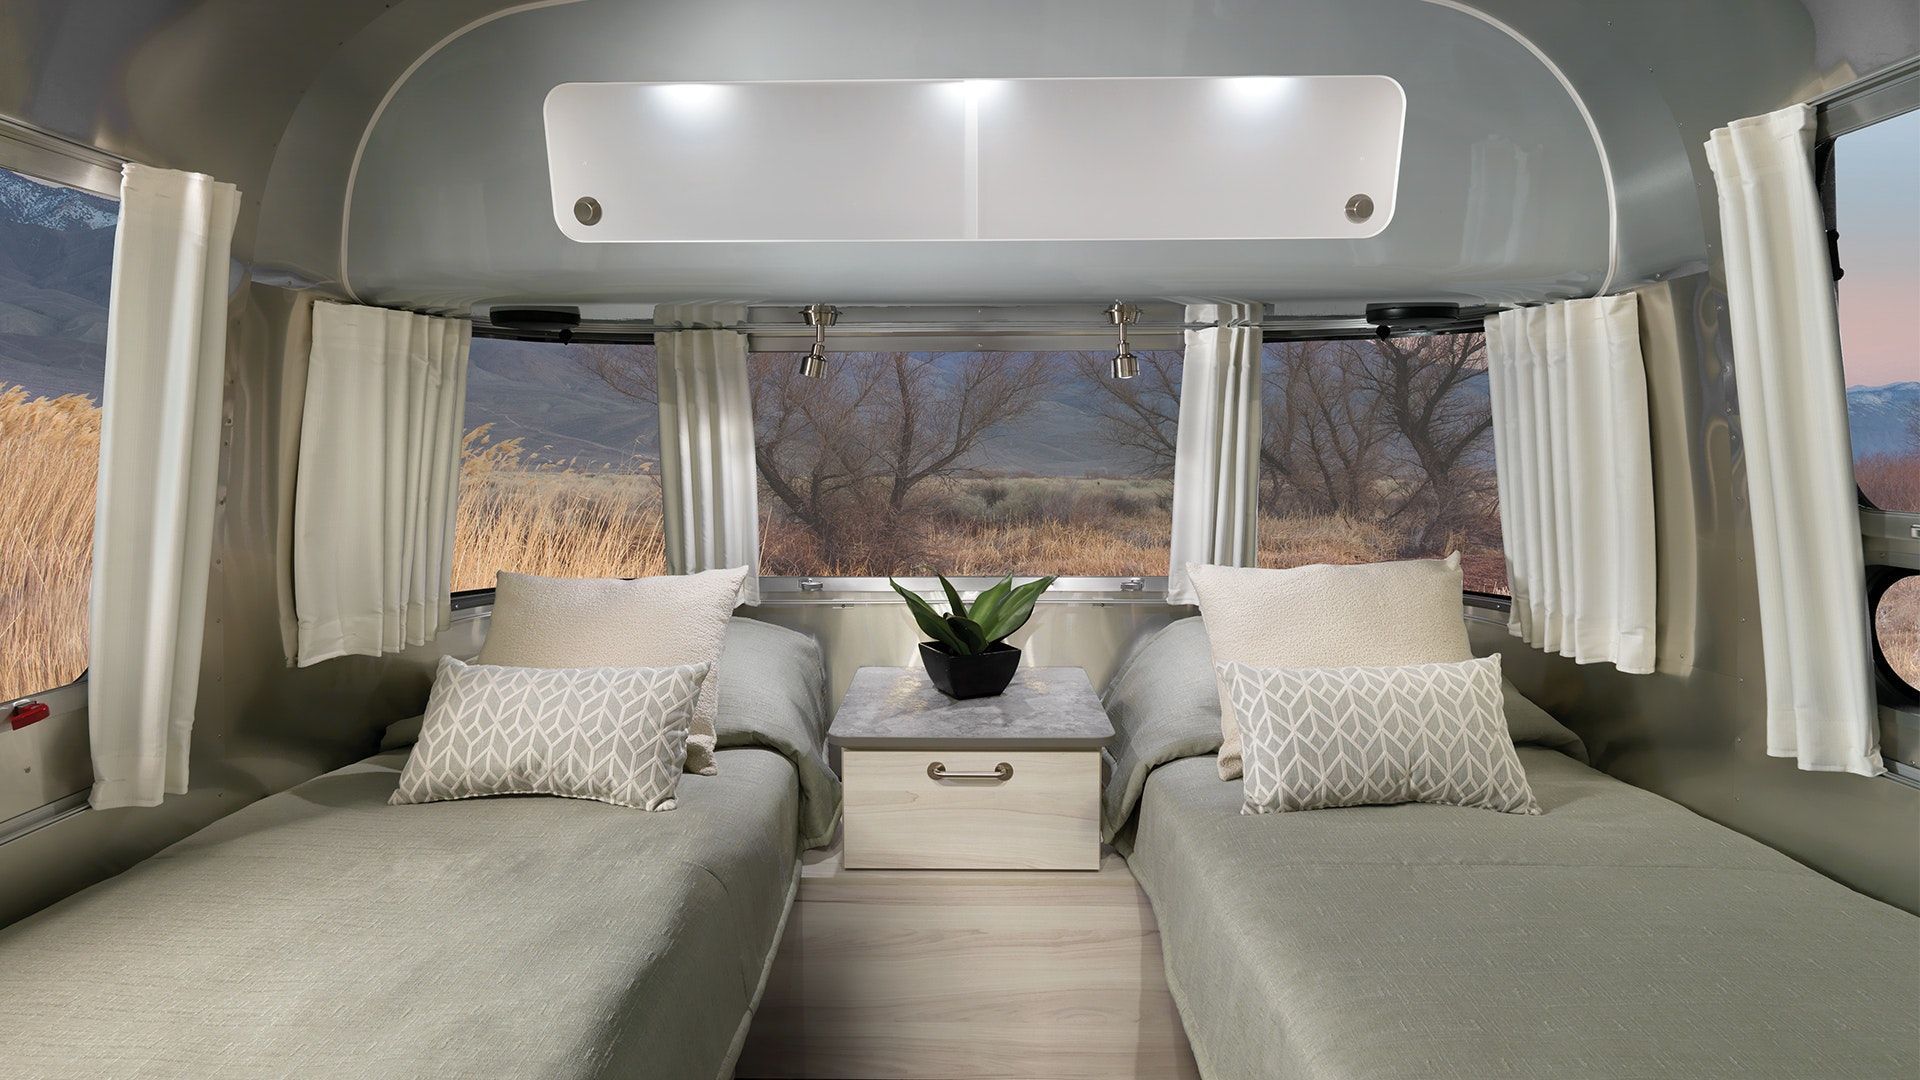 2021-Airstream-International-Interior-Master-Bedroom-Twin-Beds-Coastal-Cove